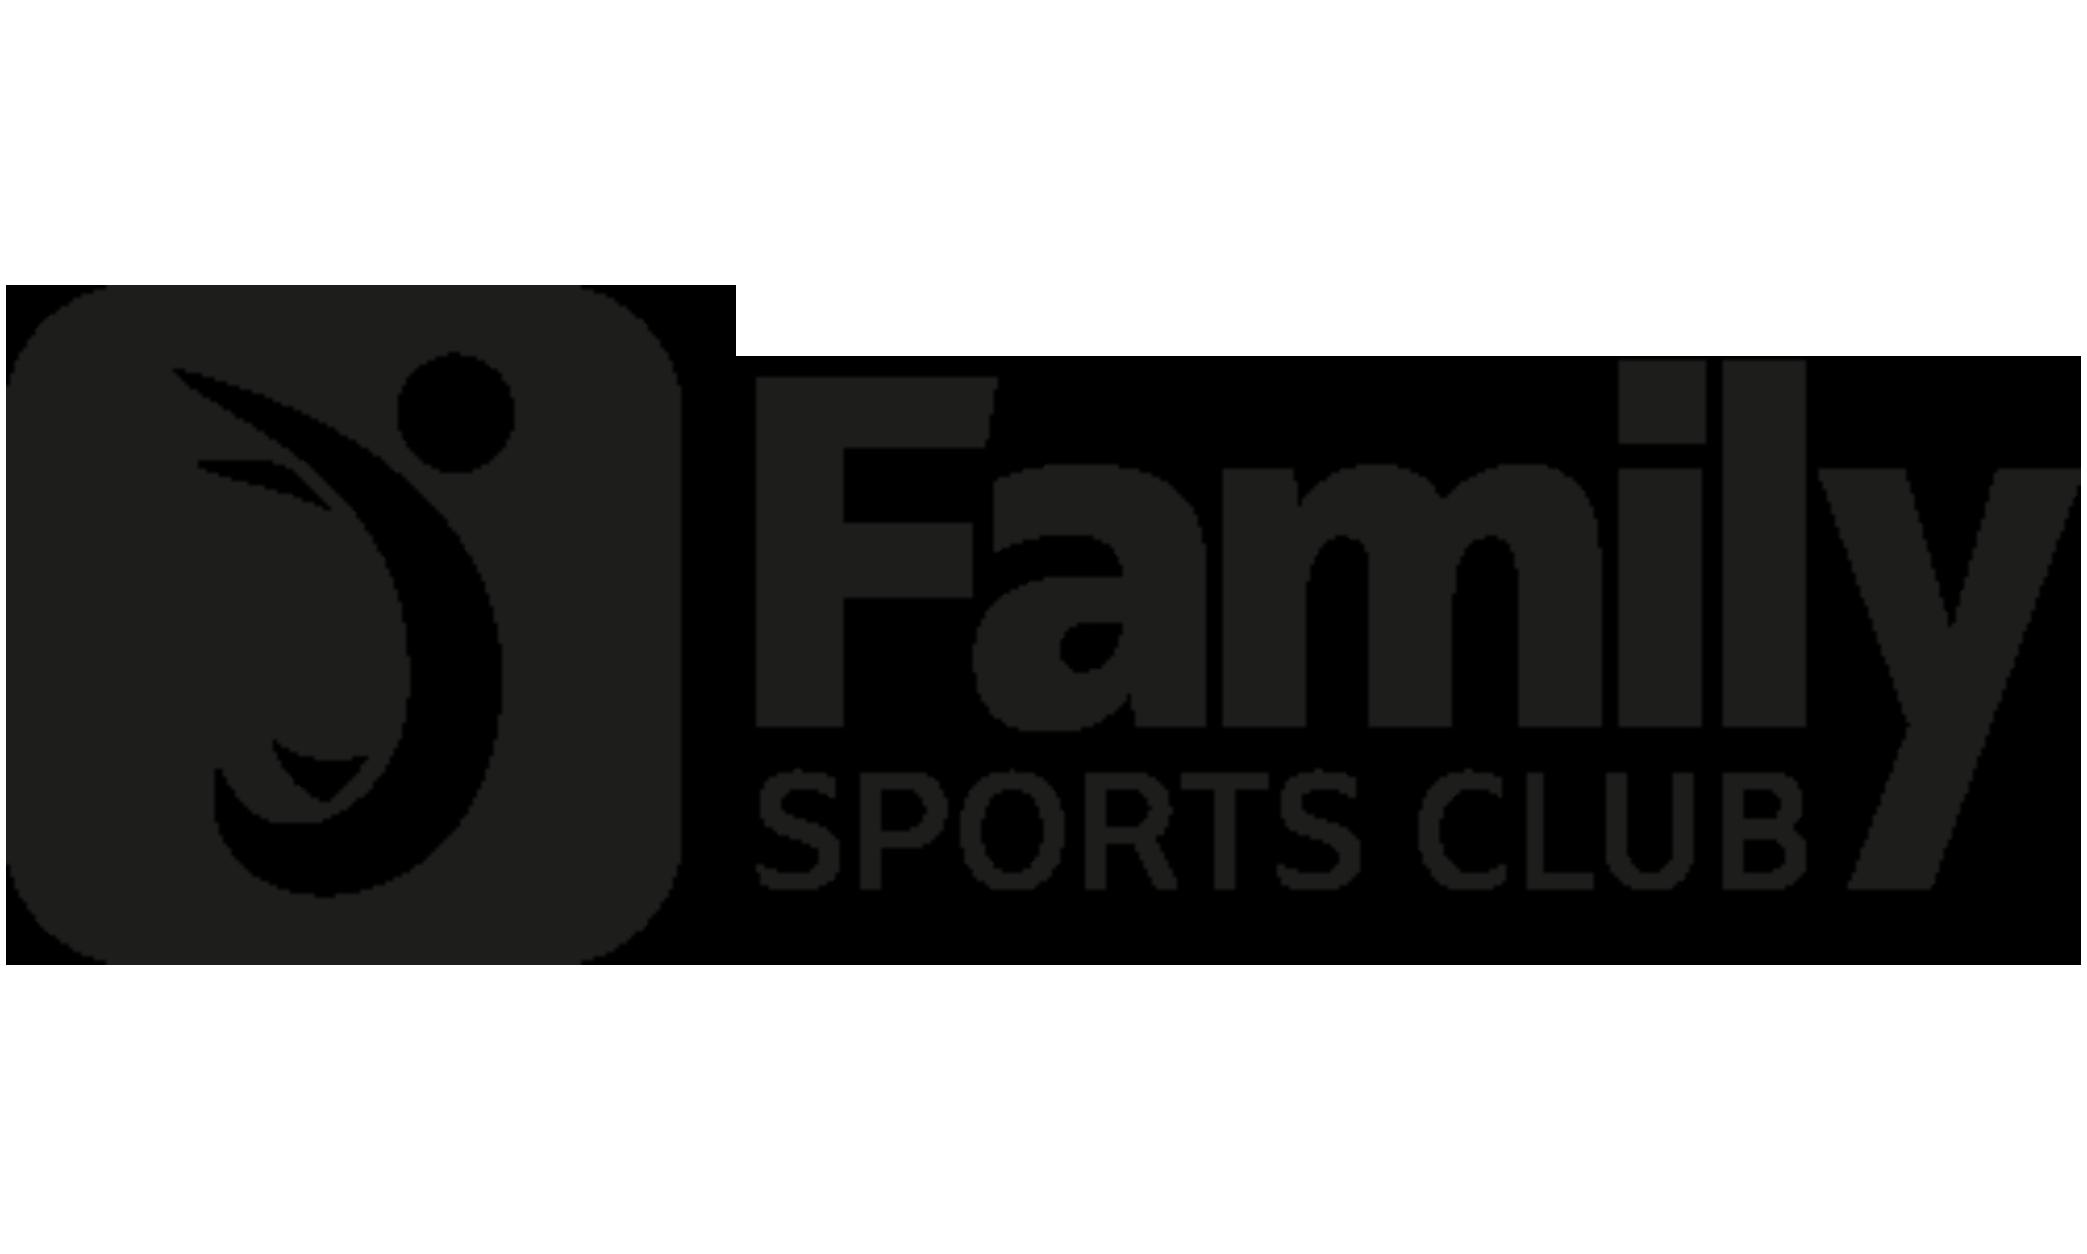 familysportsclub_logo.png